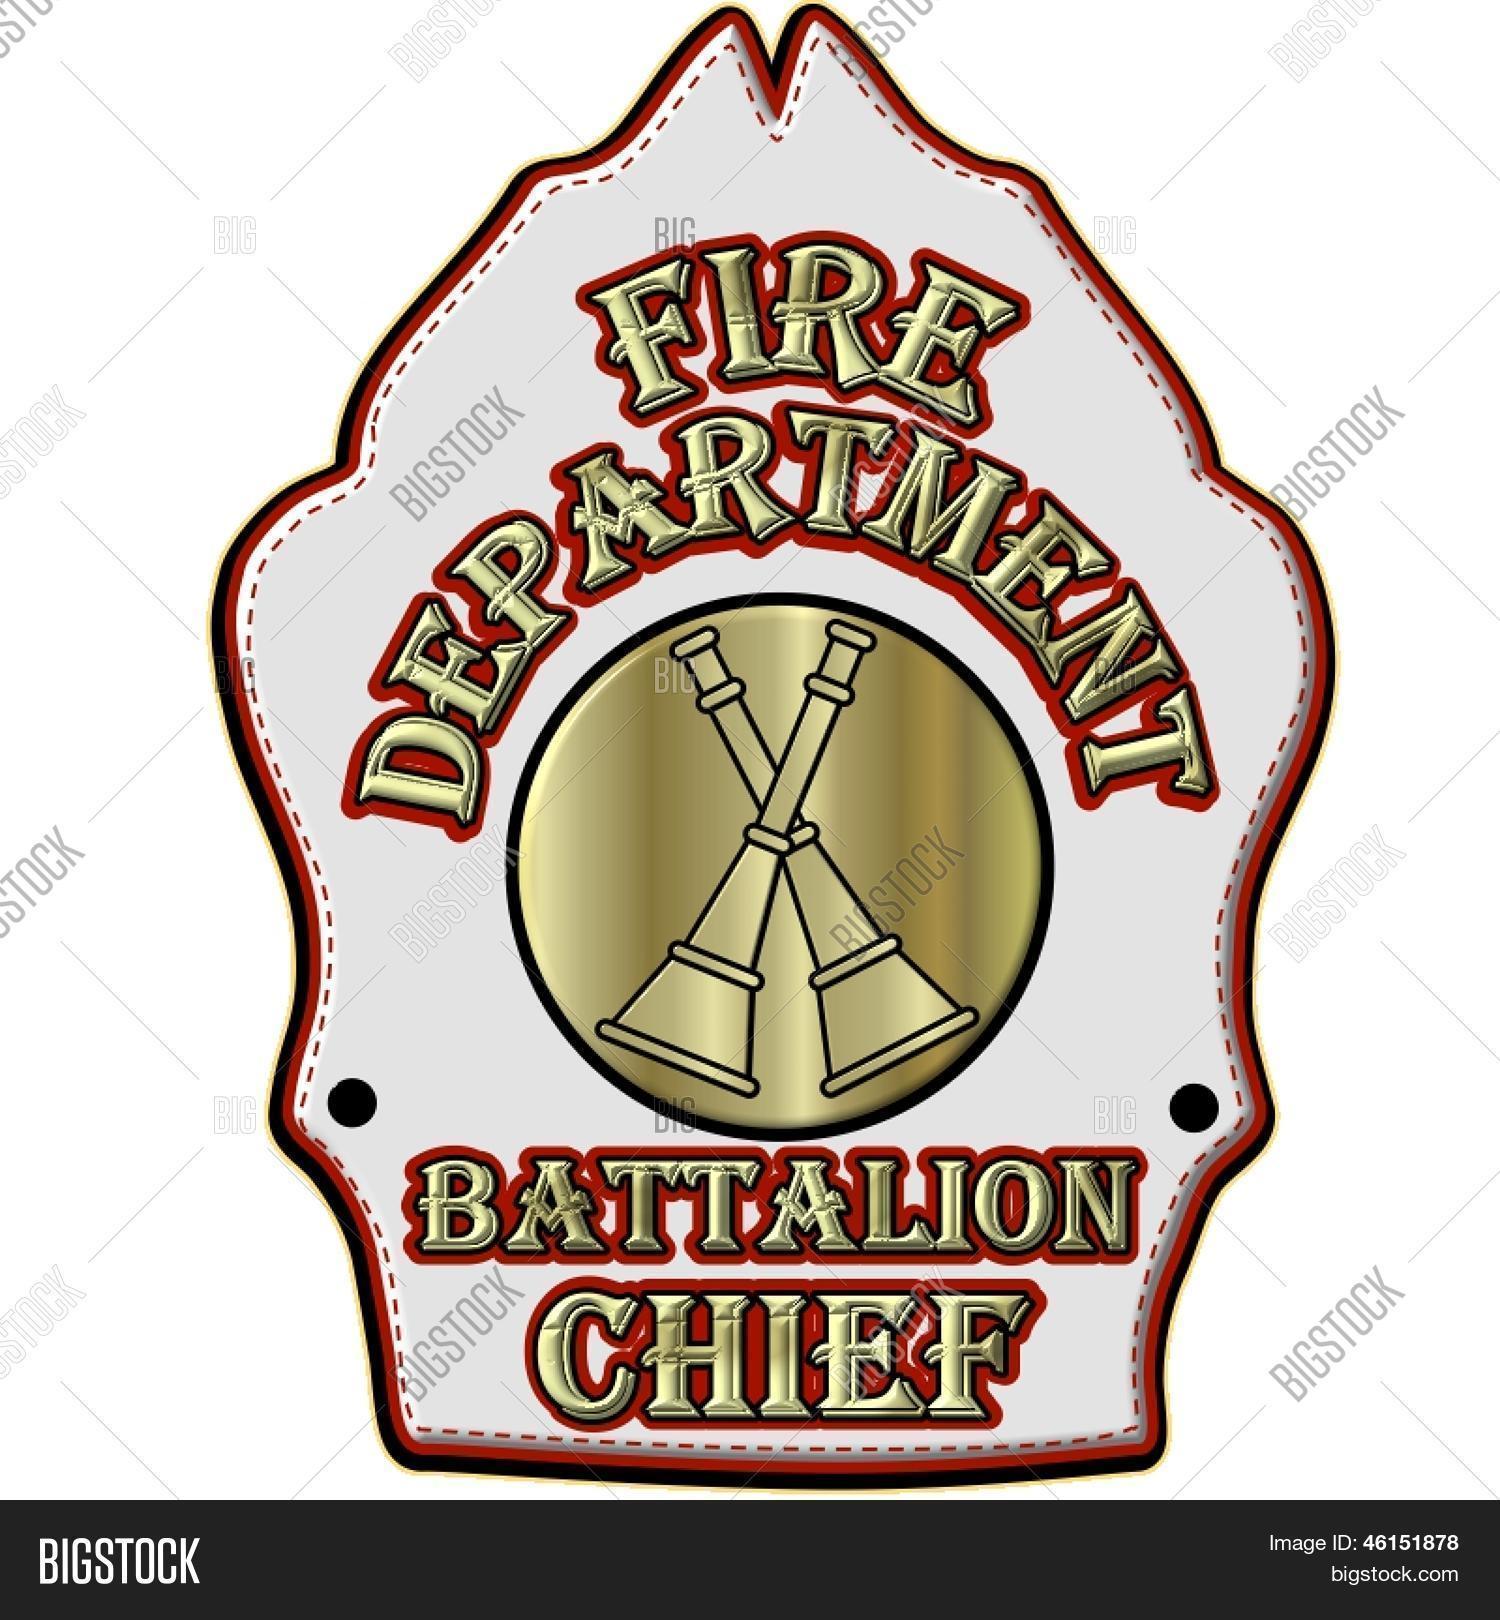 fire department battalion chief helmet shield stock photo stock images bigstock. Black Bedroom Furniture Sets. Home Design Ideas